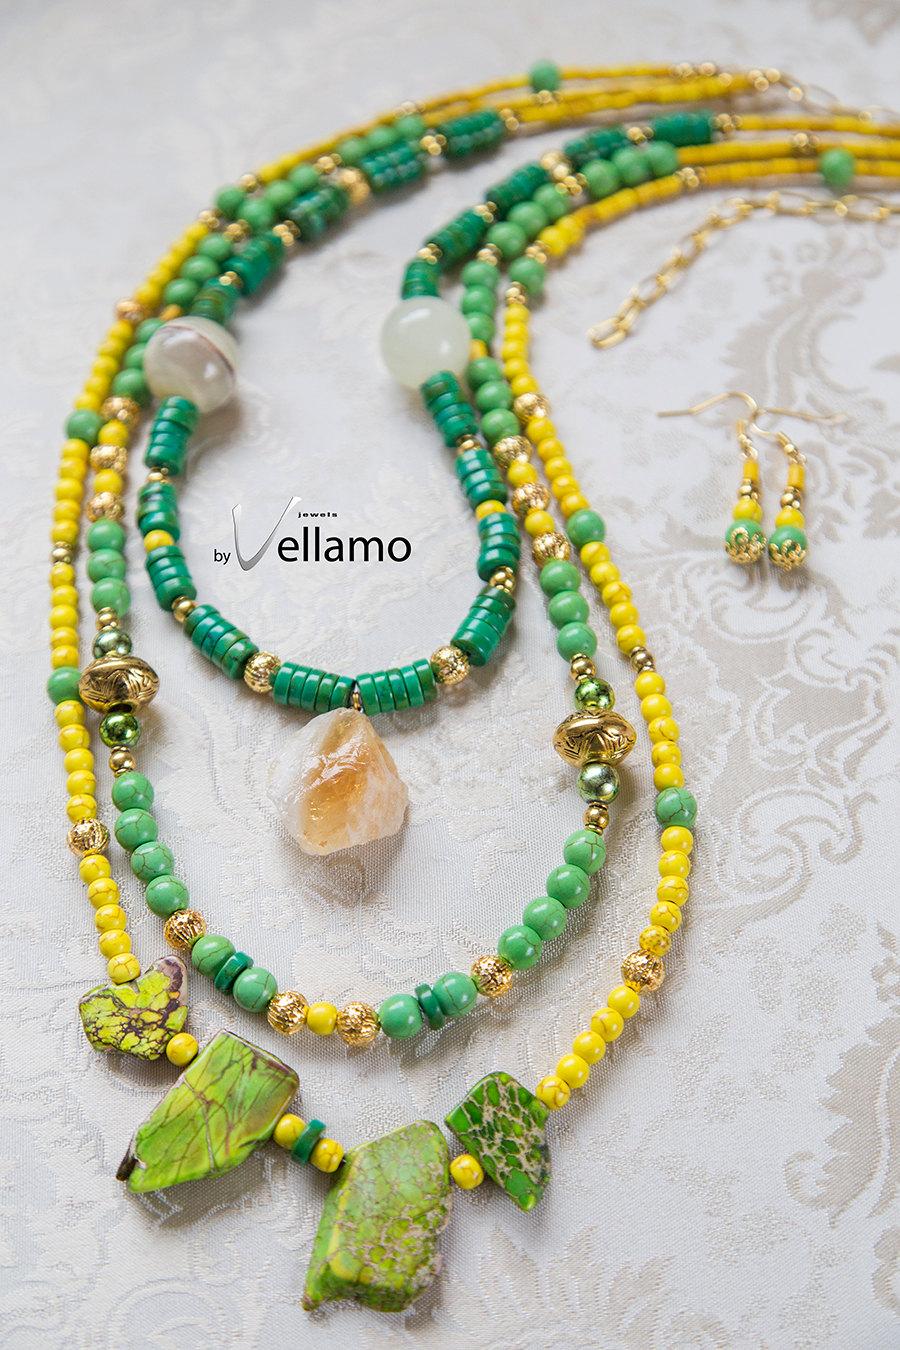 Large green and yellow multi strand fashion statement necklace large green and yellow multi strand fashion statement necklace jasper slabs citrine pendant natural agate aloadofball Choice Image